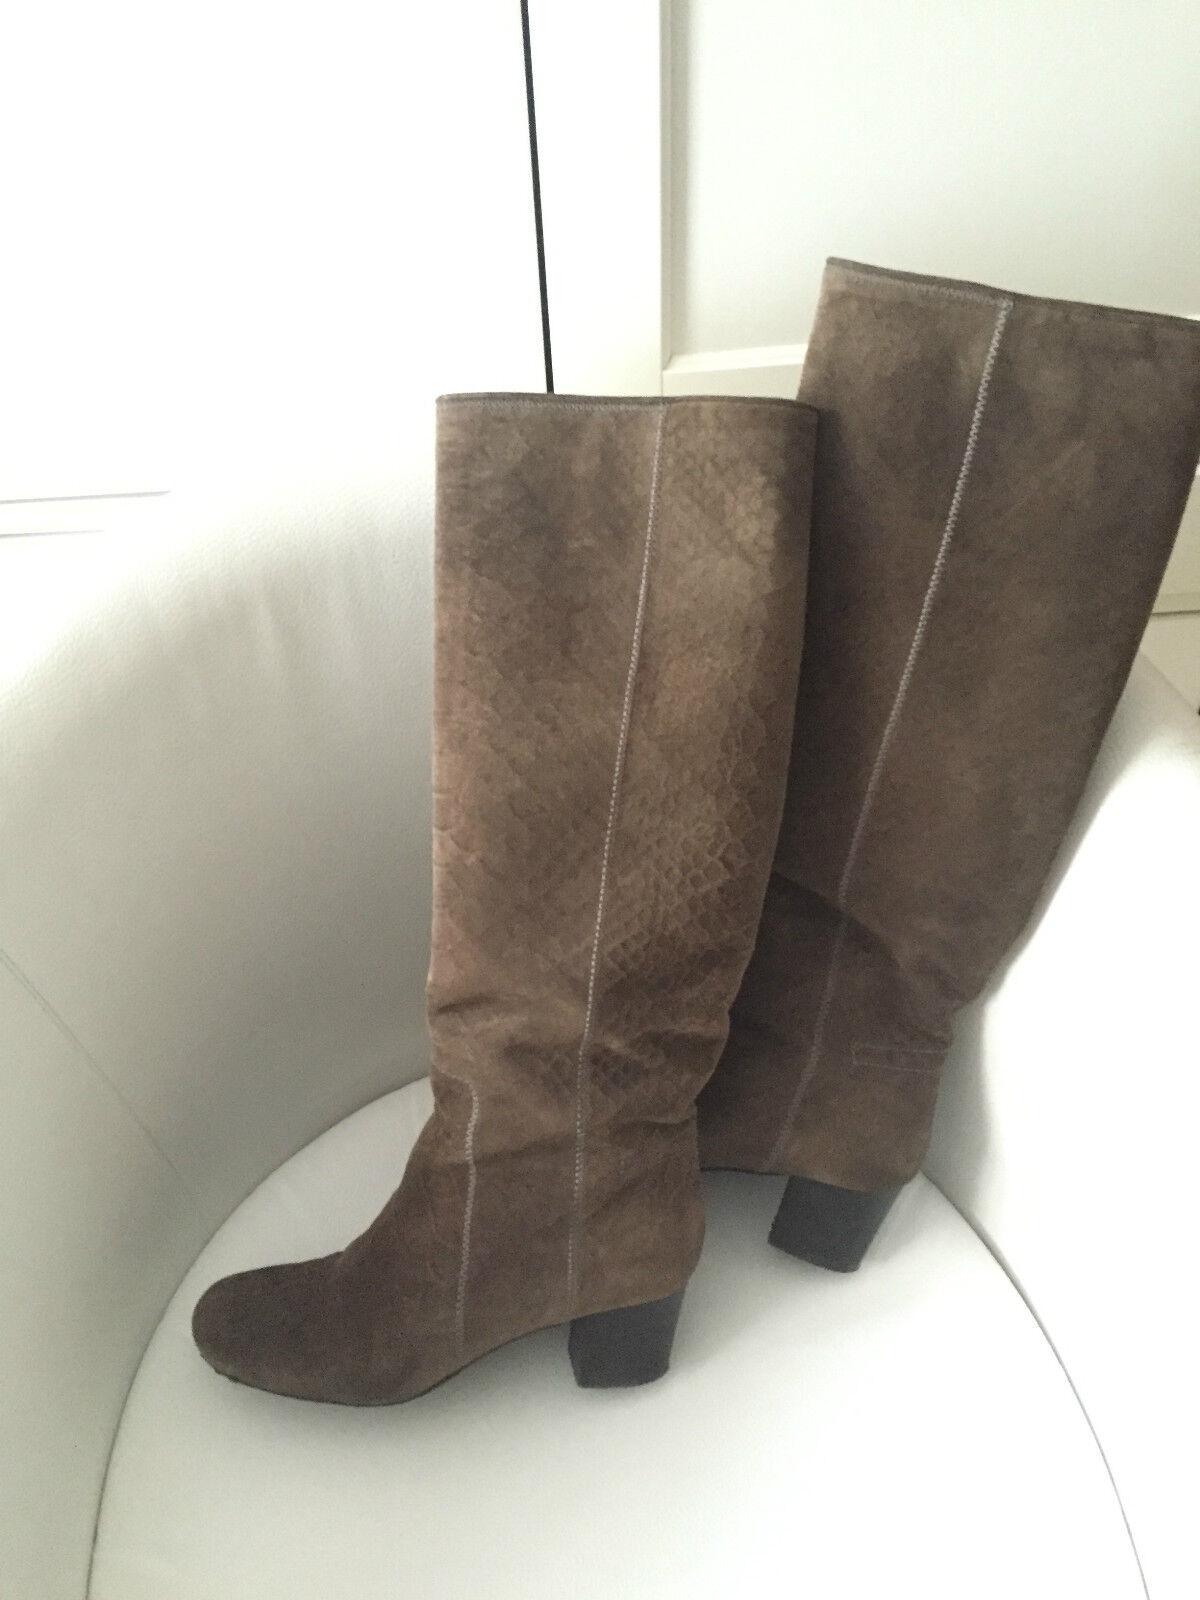 Original lanvin Paris botas de gamuza marrón EUR us 5